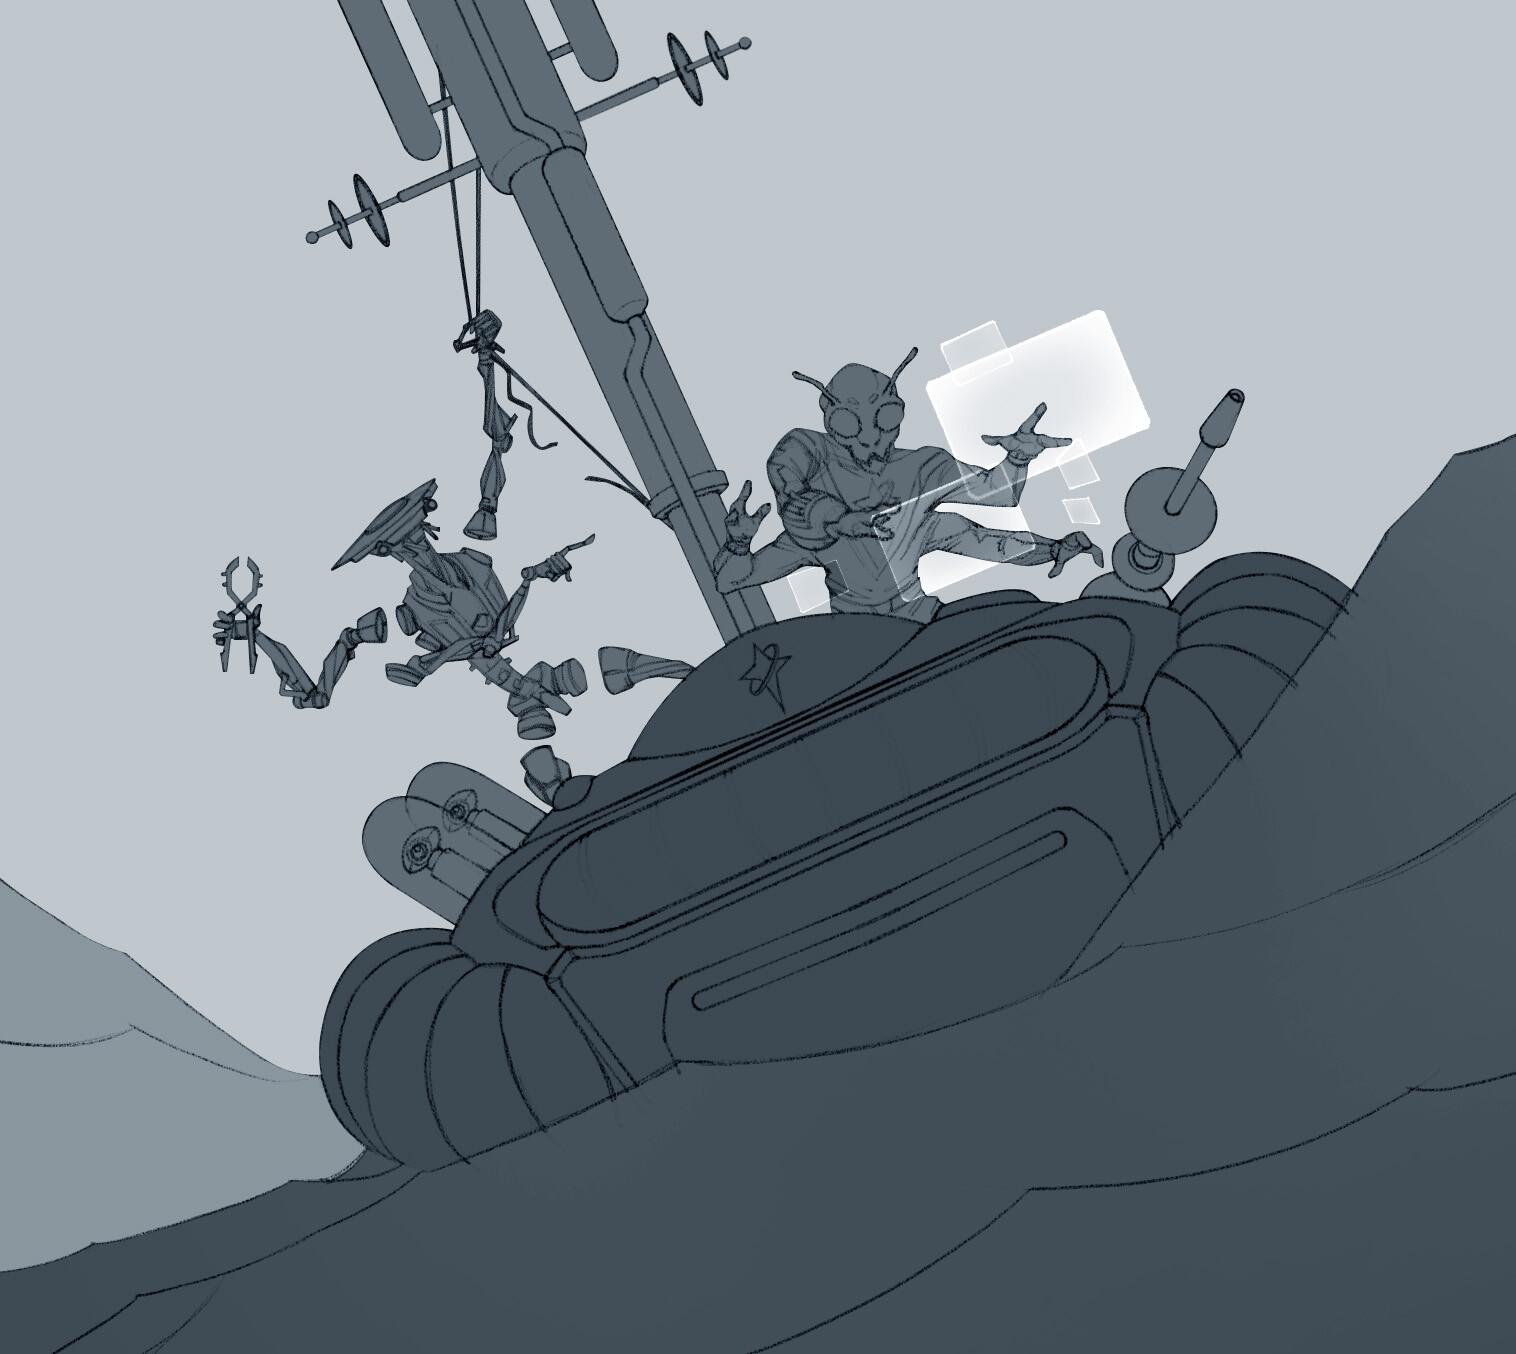 tight sketch